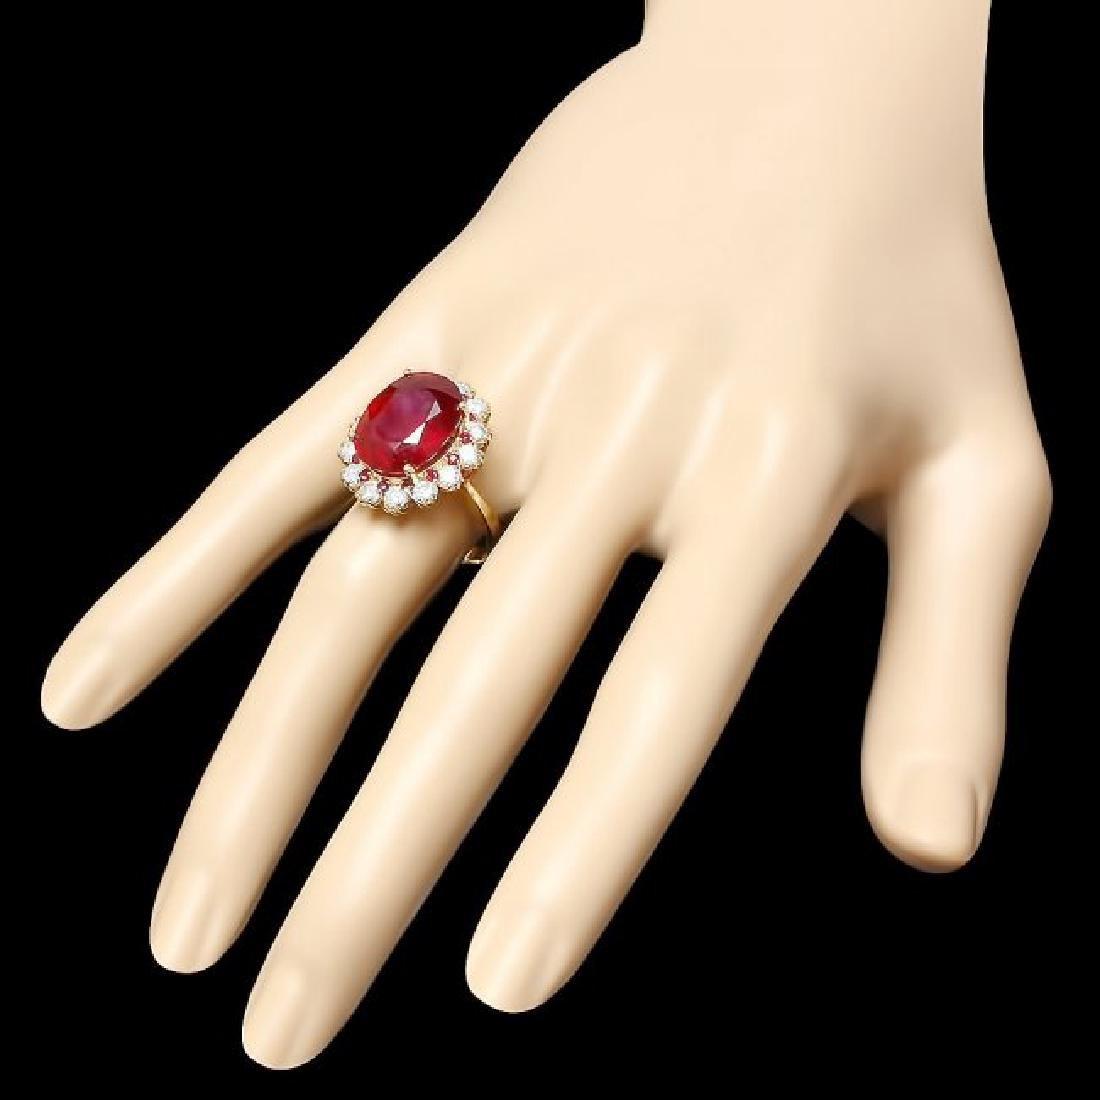 14k Yellow Gold 14.2ct Ruby 1.26ct Diamond Ring - 3